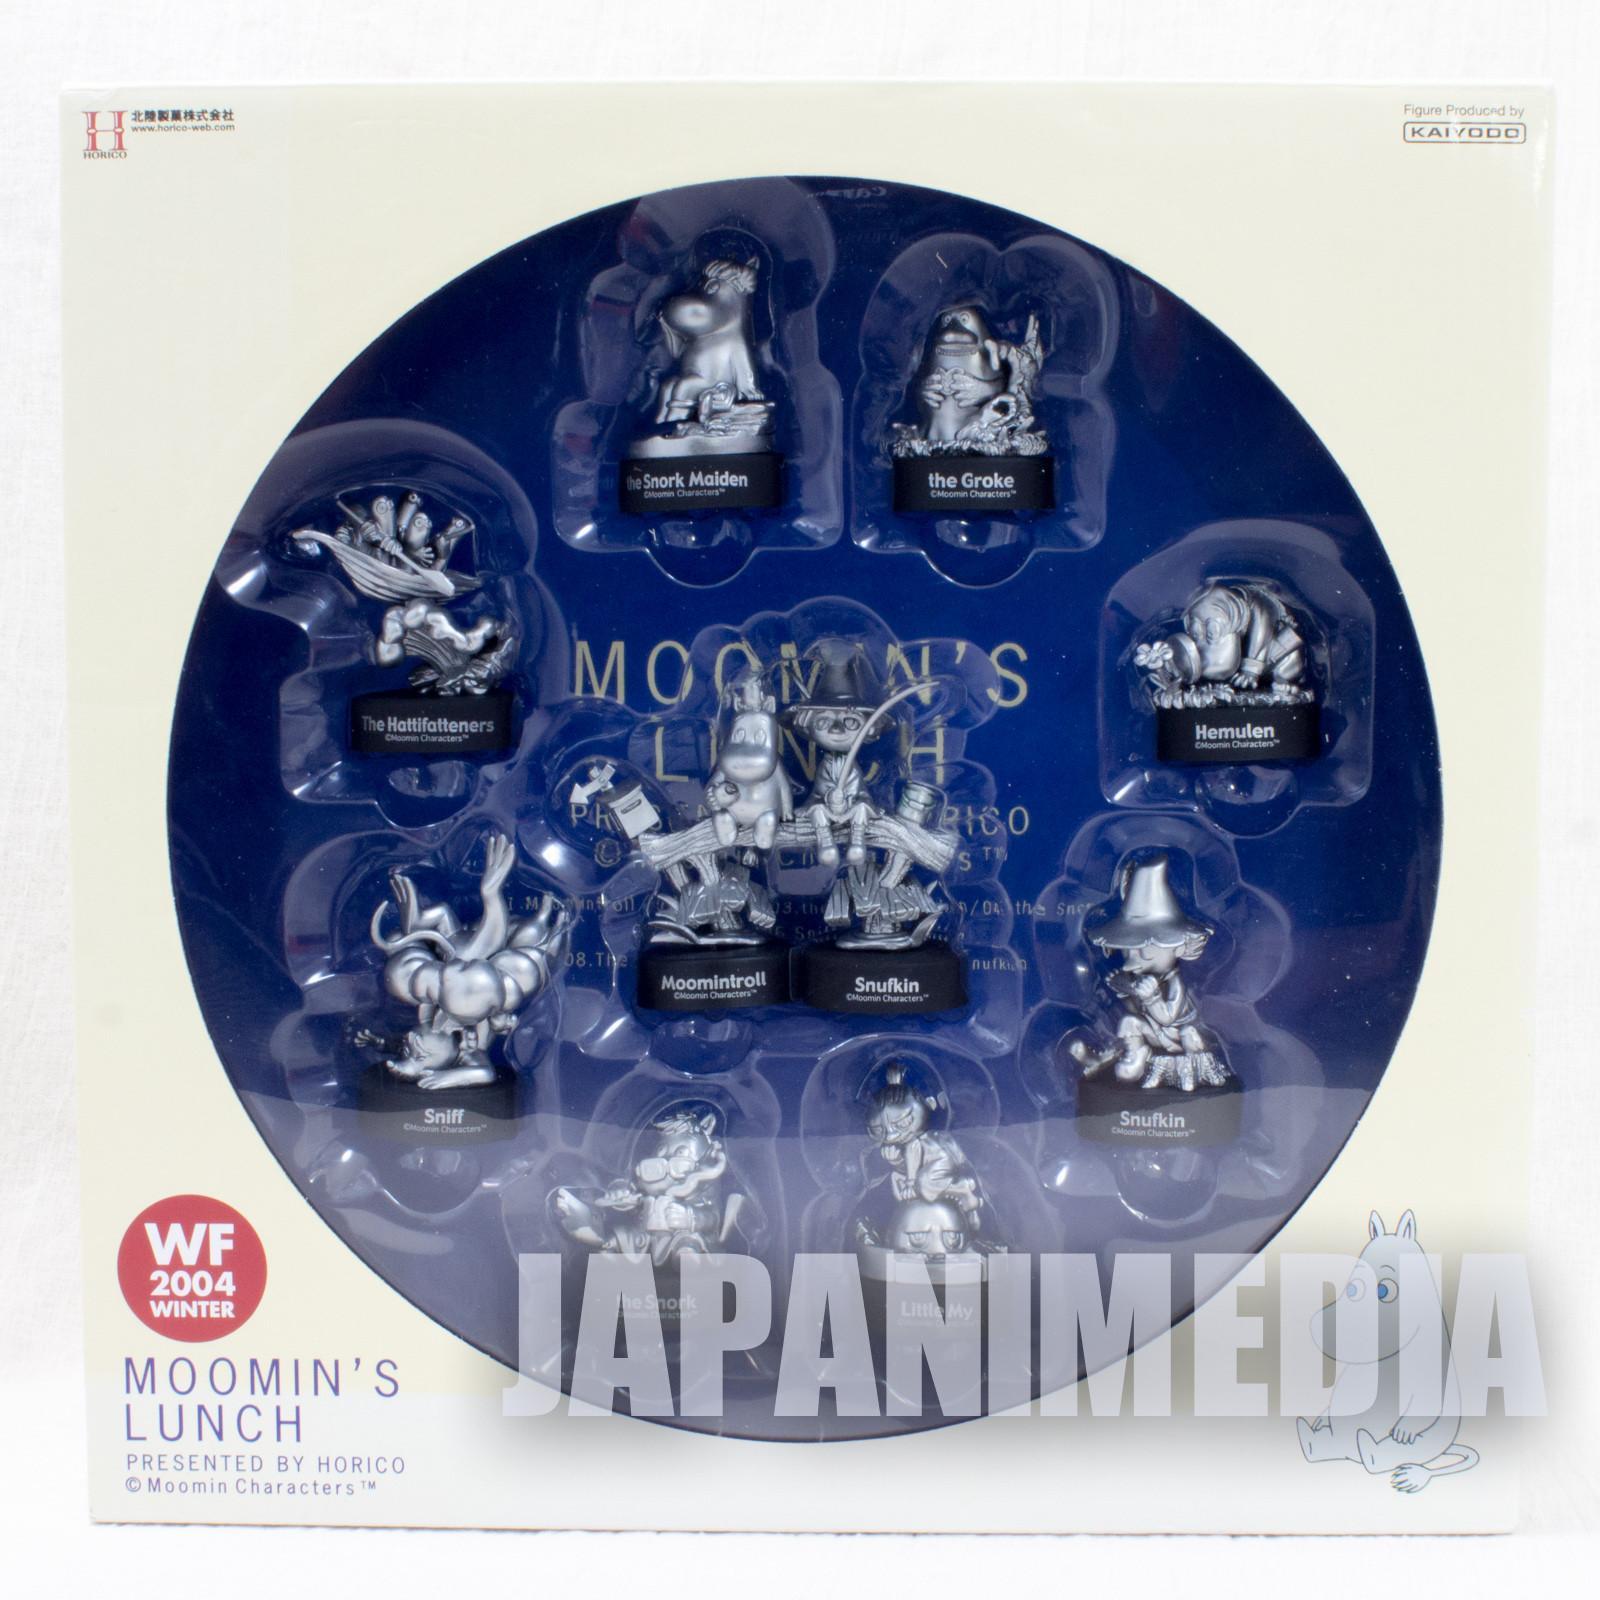 Moomin's Lunch Kaiyodo Moomin Mini Vignette Figure 10pc Collection Silver Color / WF2004 Winnter